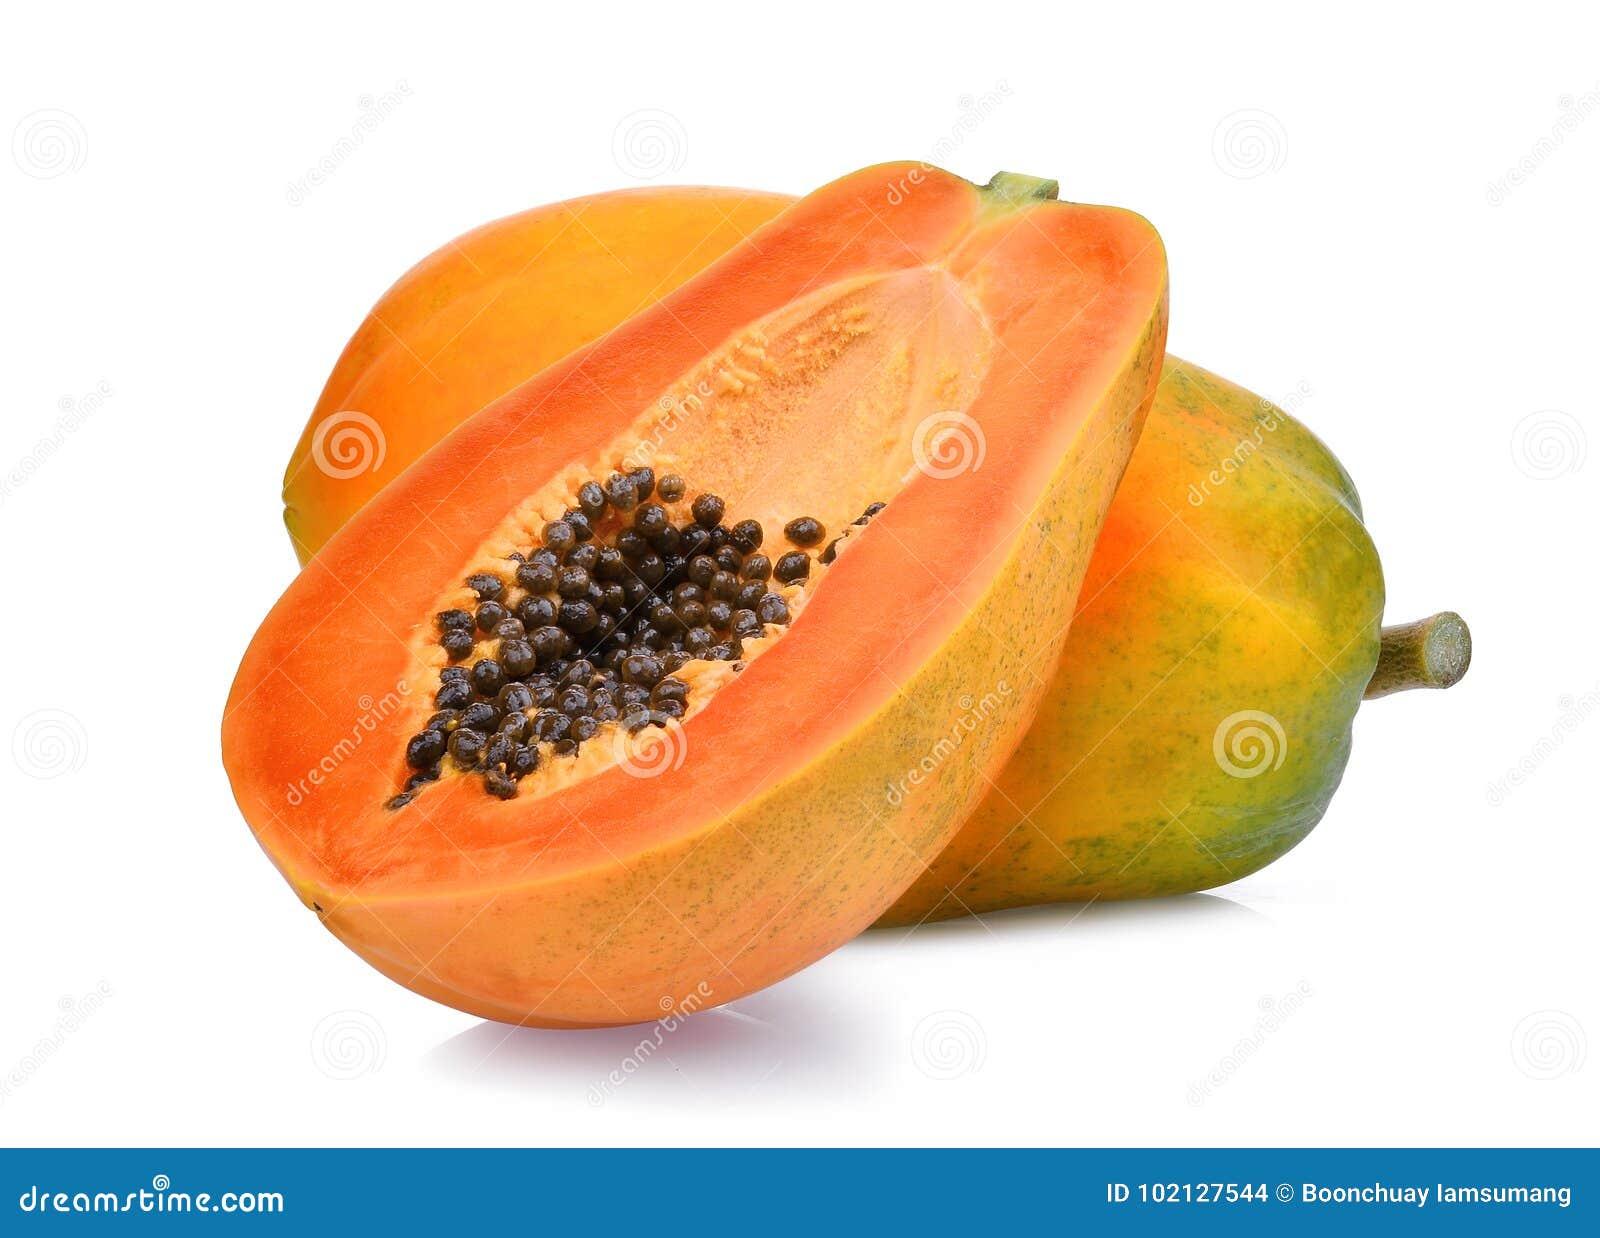 Whole and half of ripe papaya fruit with seeds on white